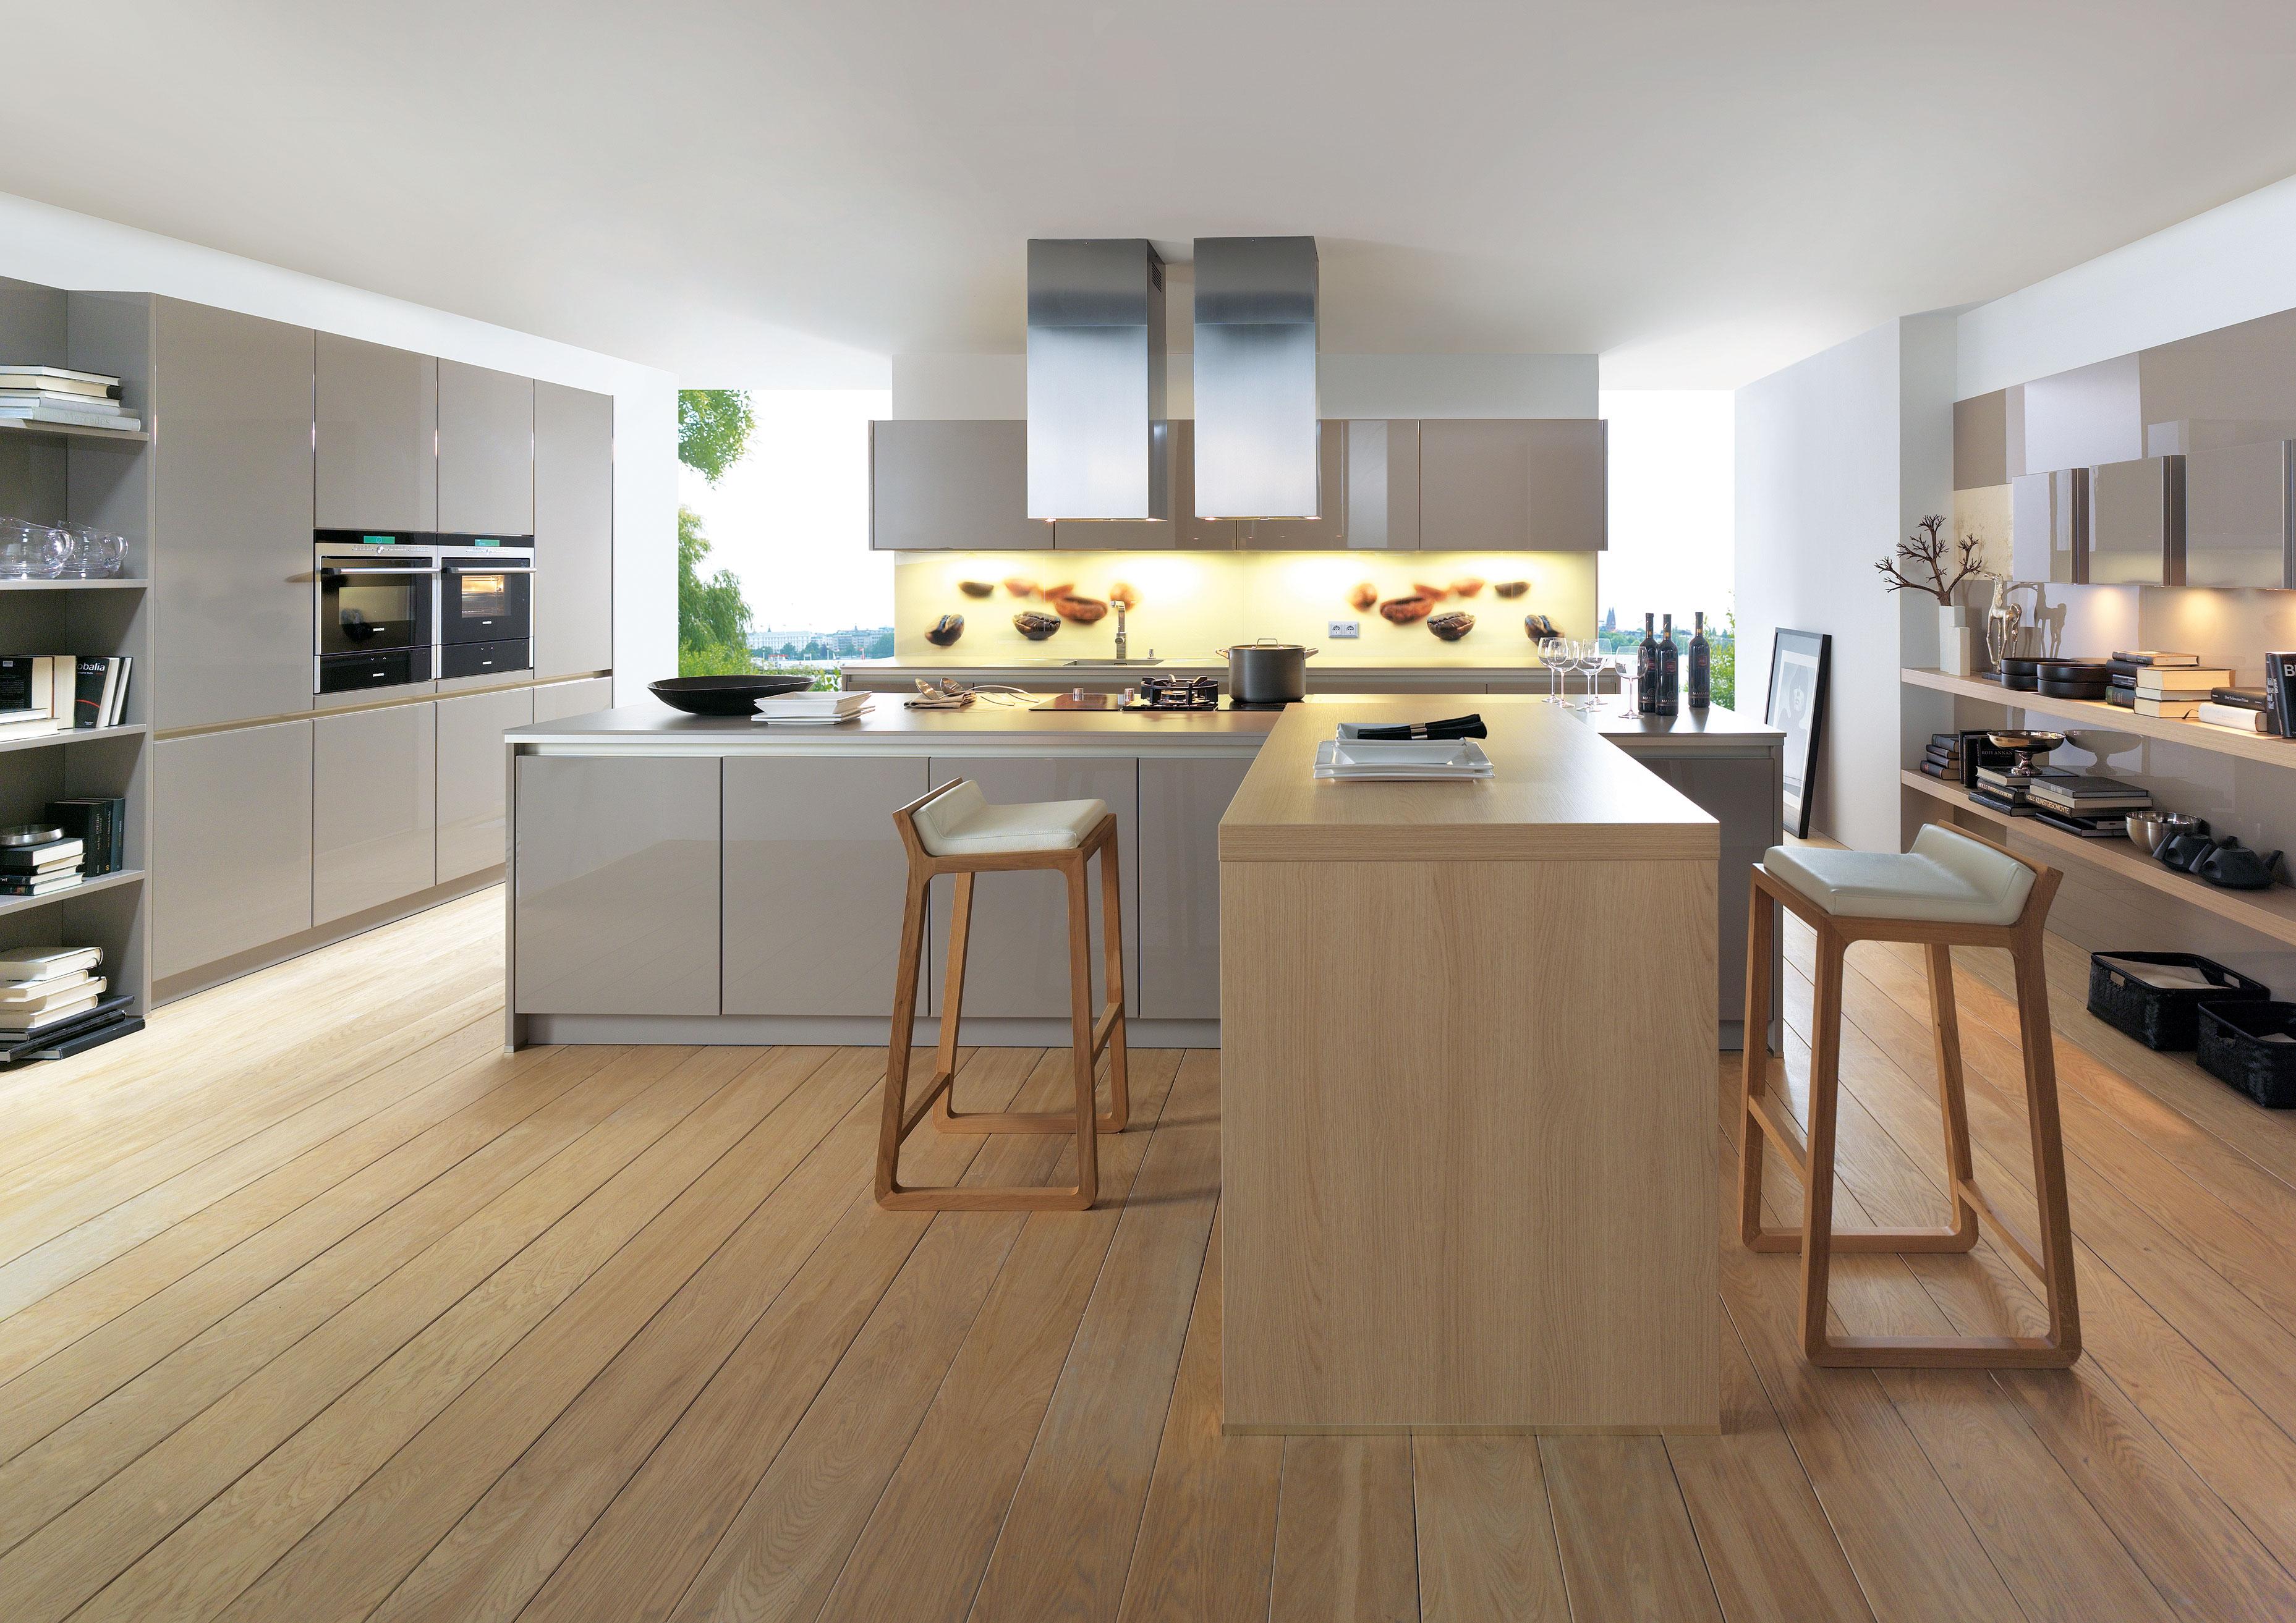 Extrem Küchenrückwand: Holz, Glas oder Metall? KM46